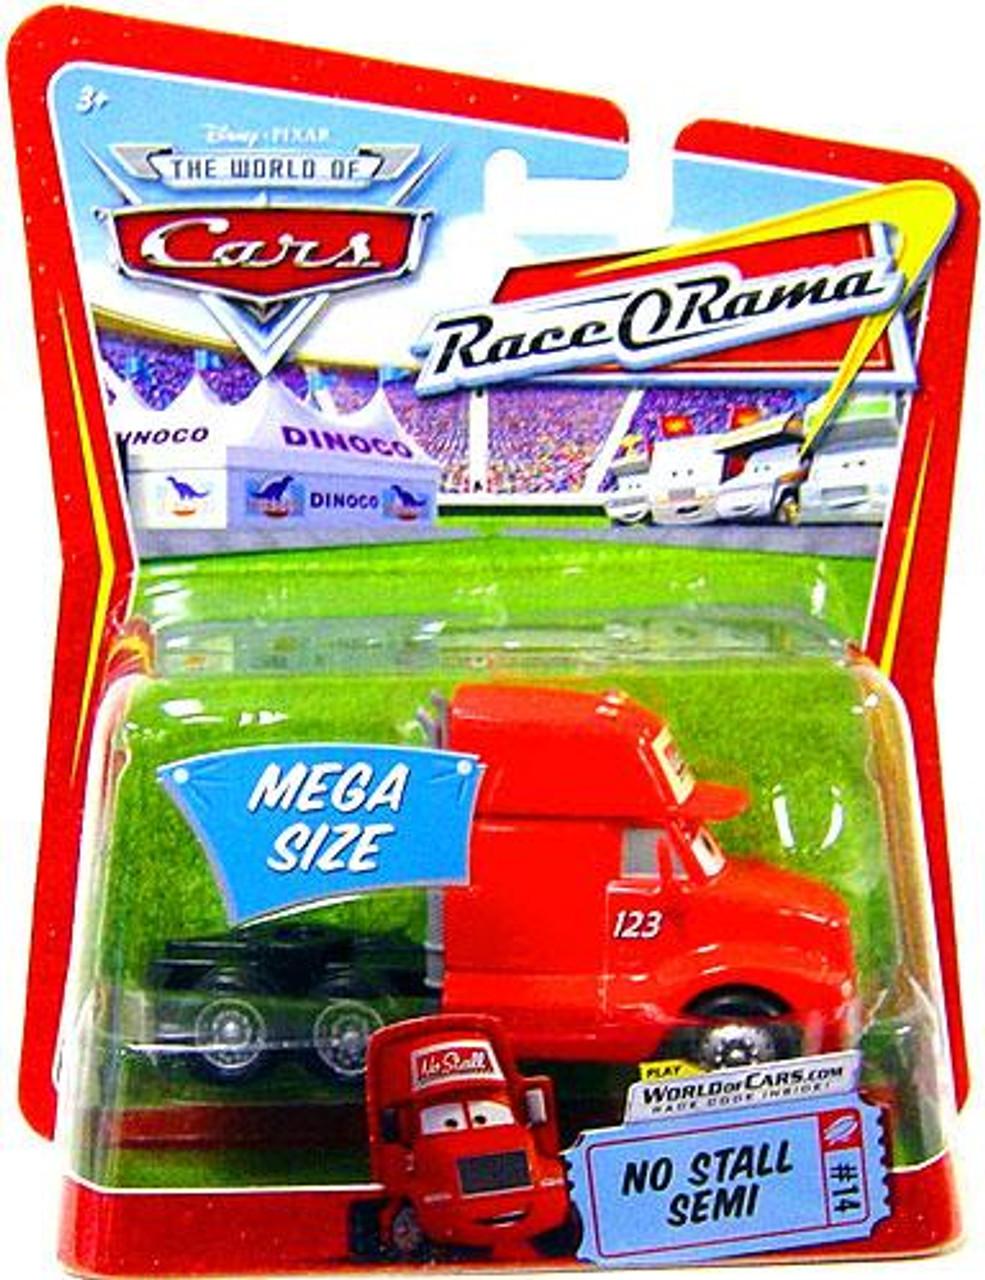 Disney Cars The World of Cars Race-O-Rama No Stall Semi Diecast Car #14